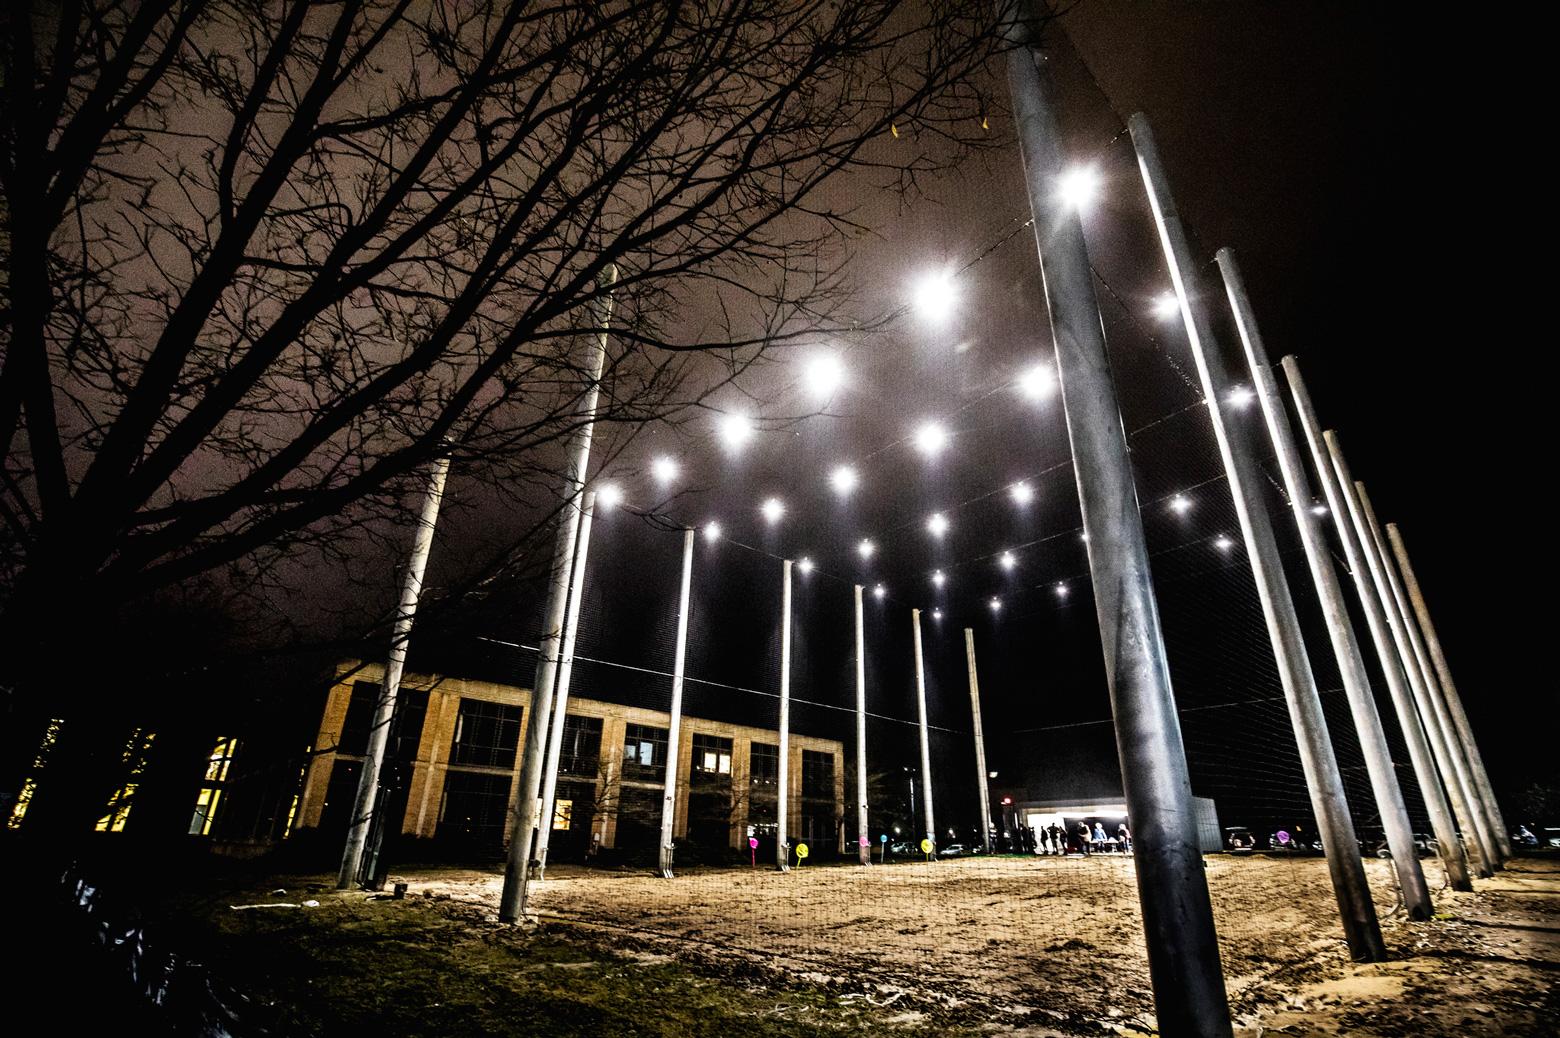 The M-Air facility lit up at night